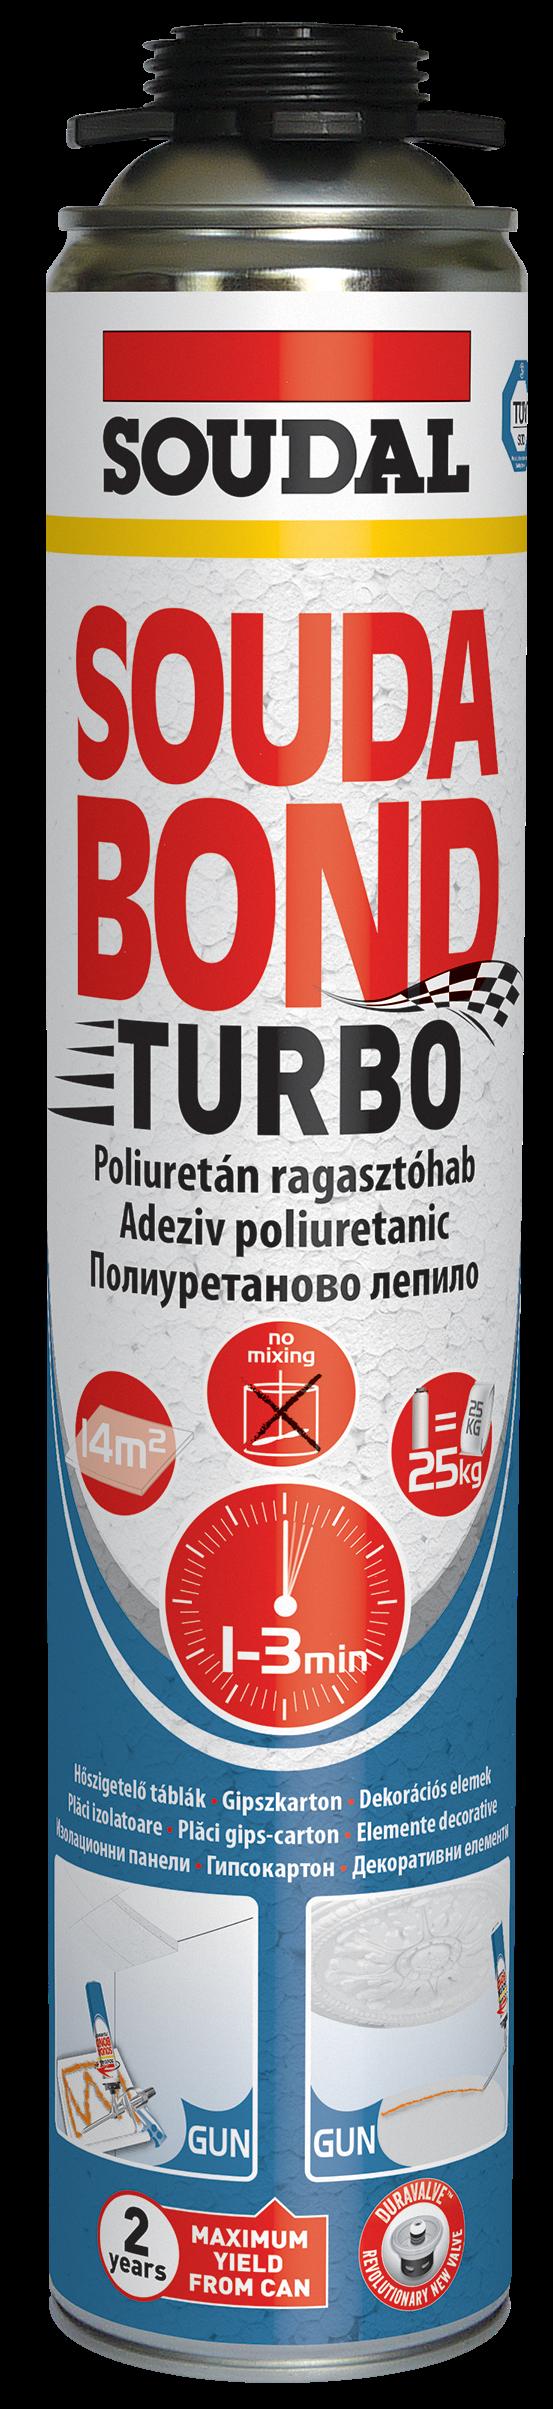 SoudaBond Turbo